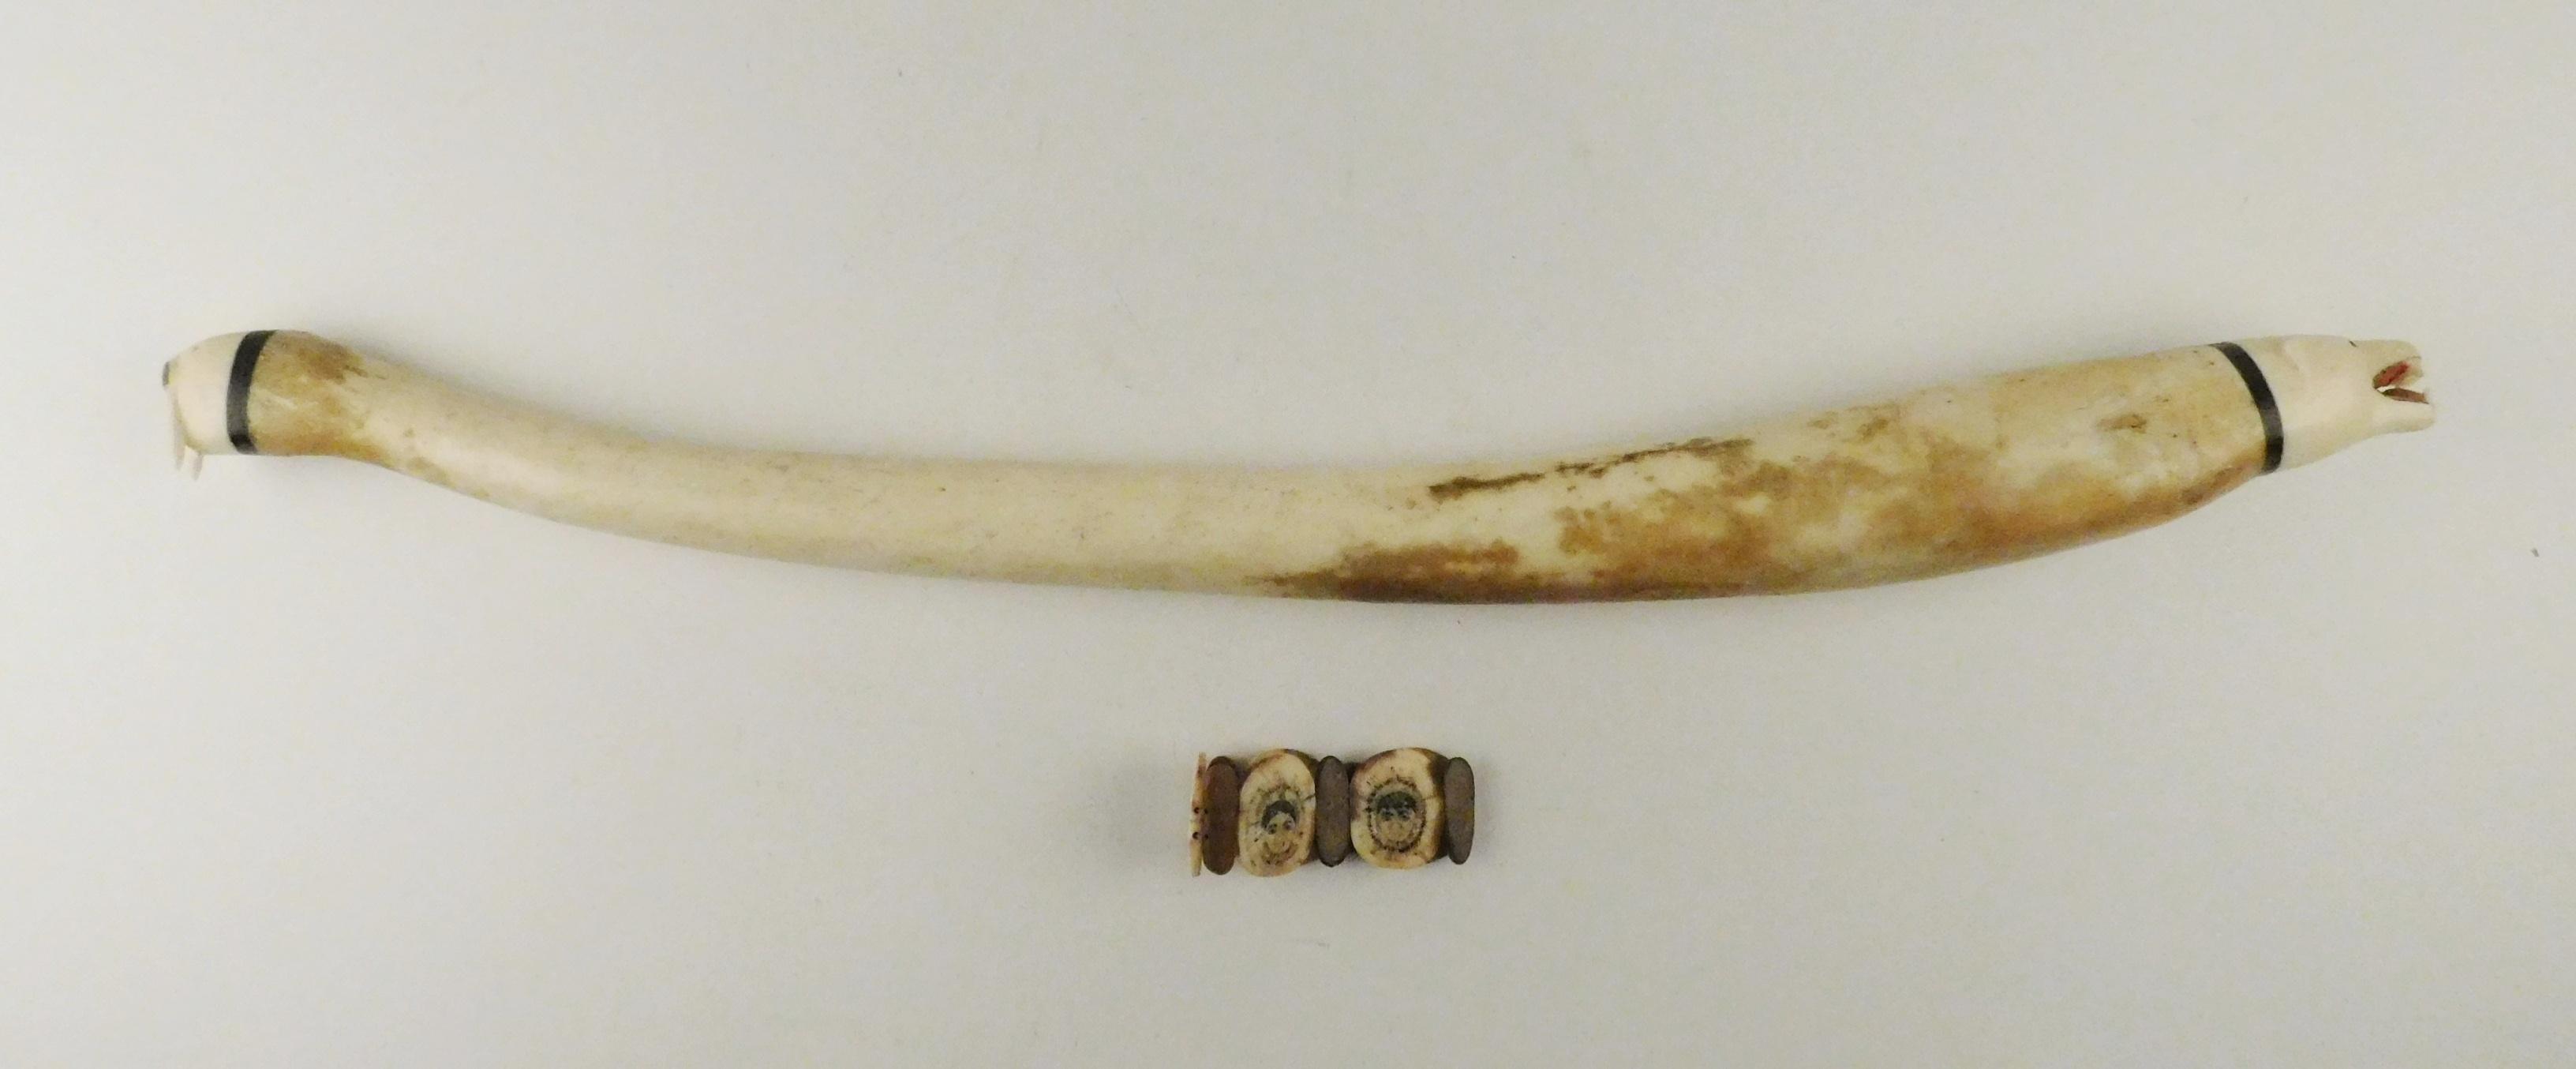 Walrus Oosik carving and Inuit bracelet